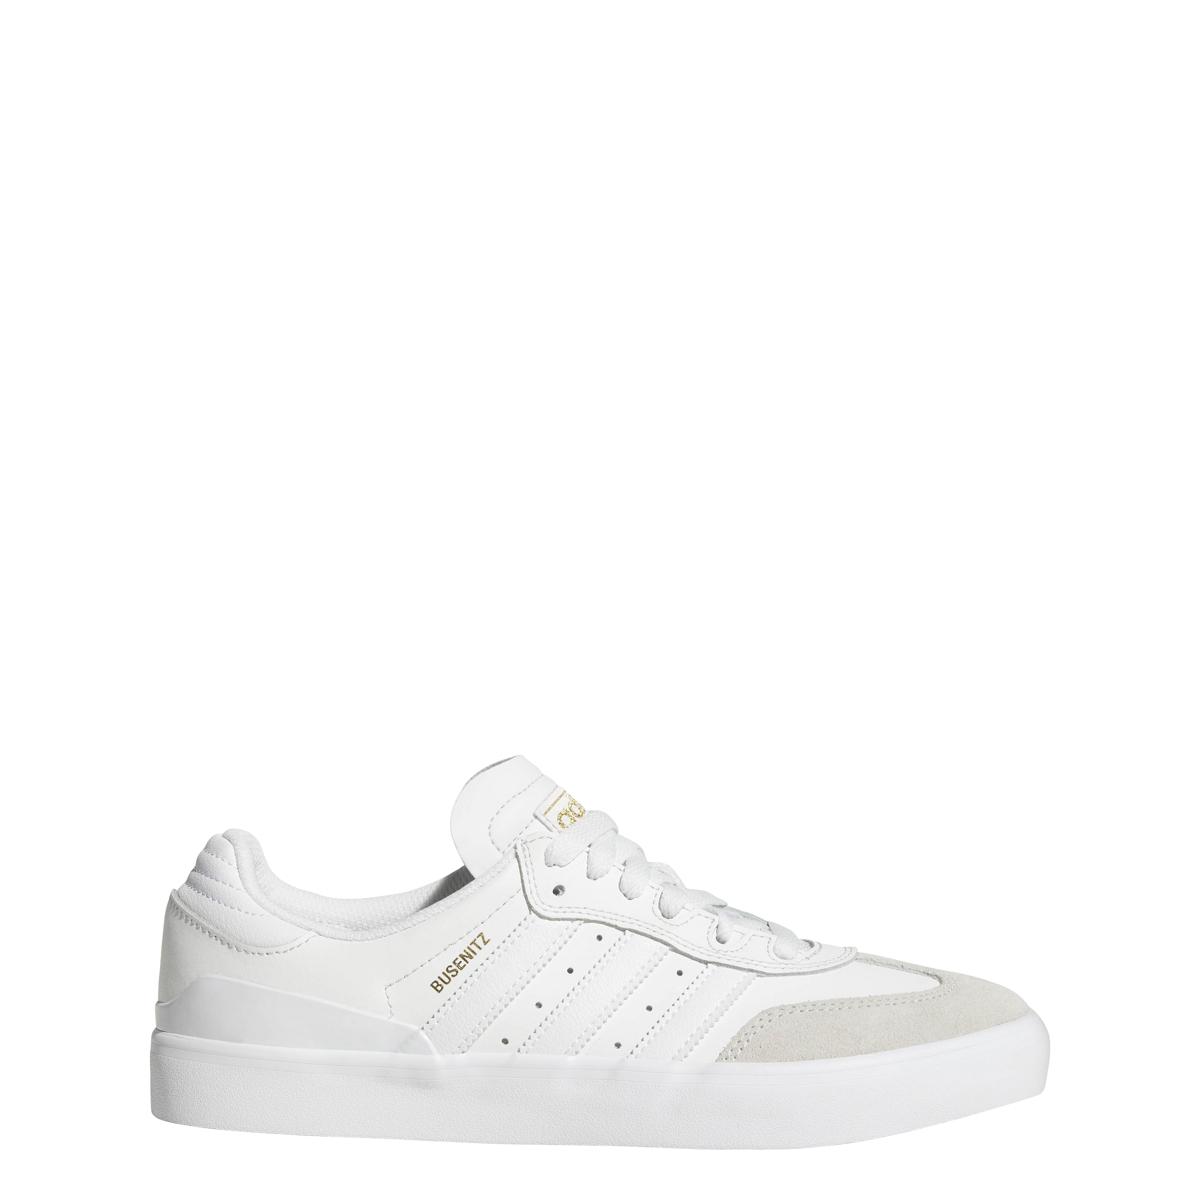 adidas Busenitz In Suede And Hemp | Style | Adidas busenitz